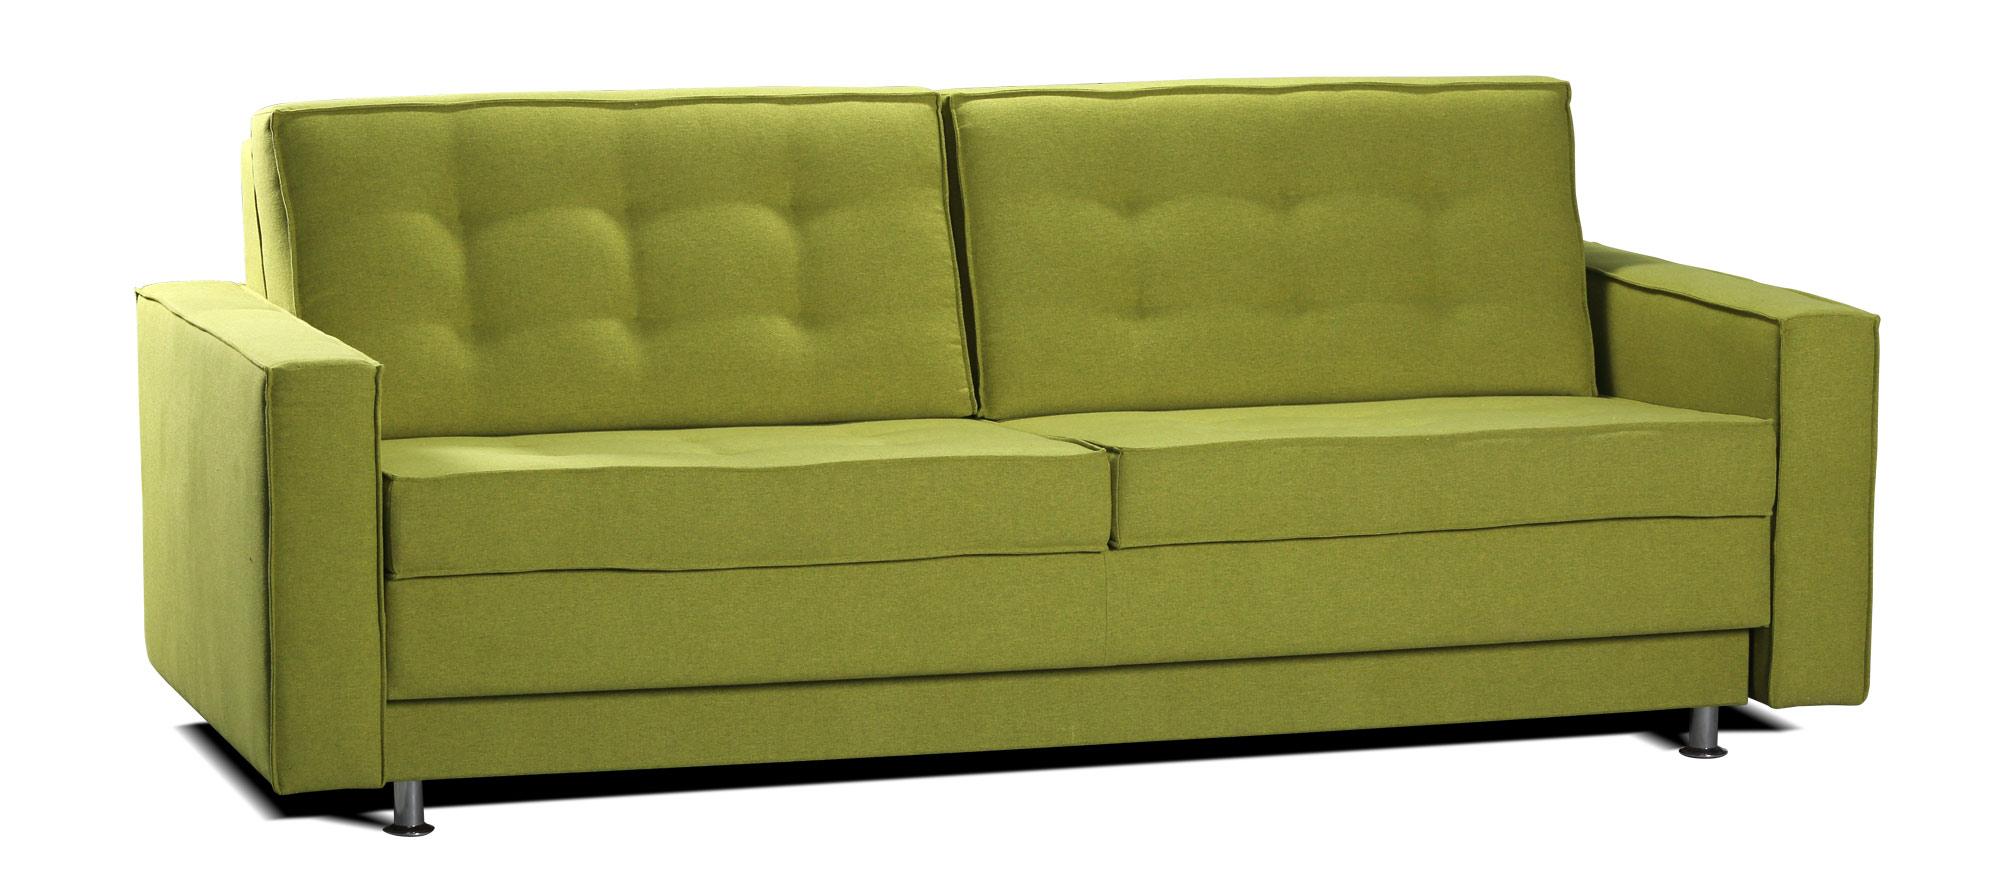 carrera salon meblowy vega meble. Black Bedroom Furniture Sets. Home Design Ideas